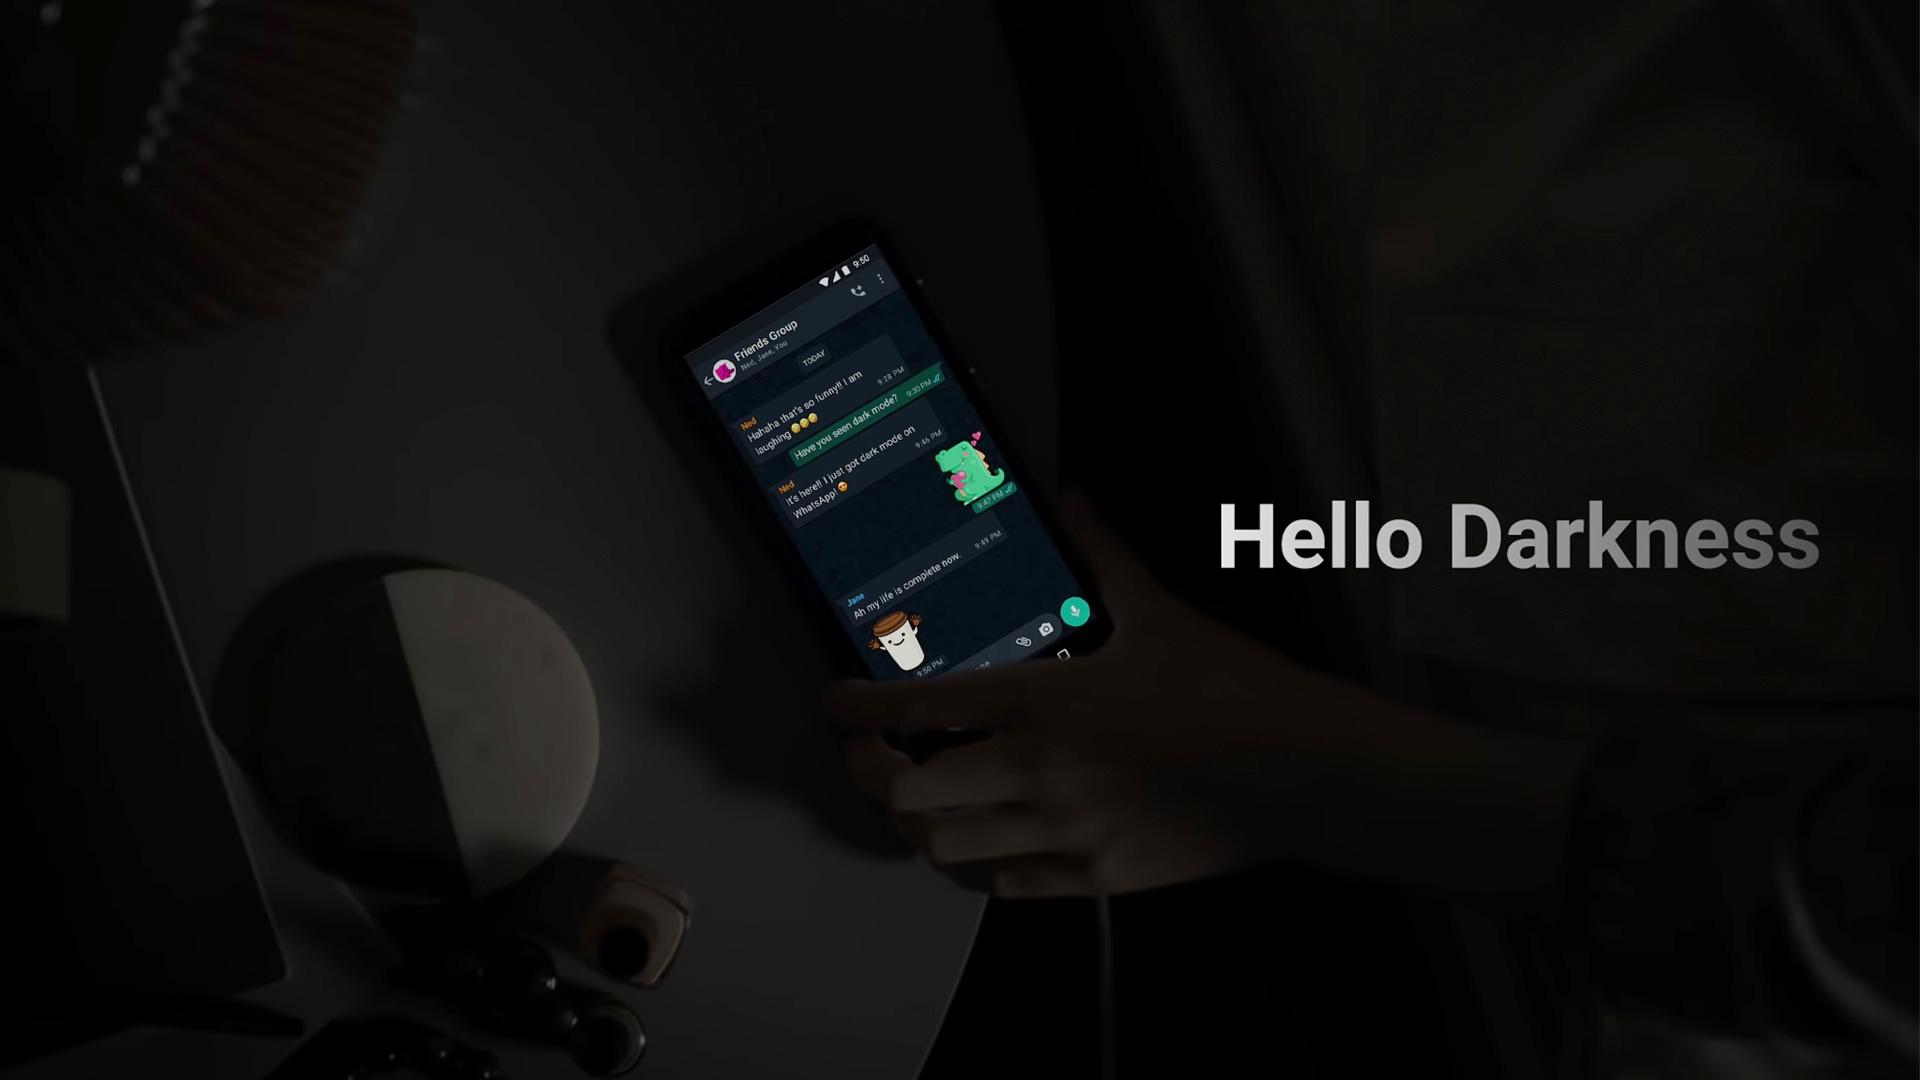 Screenshot of WhatsApp dark mode video (a hand reaching for a phone in a dark room)